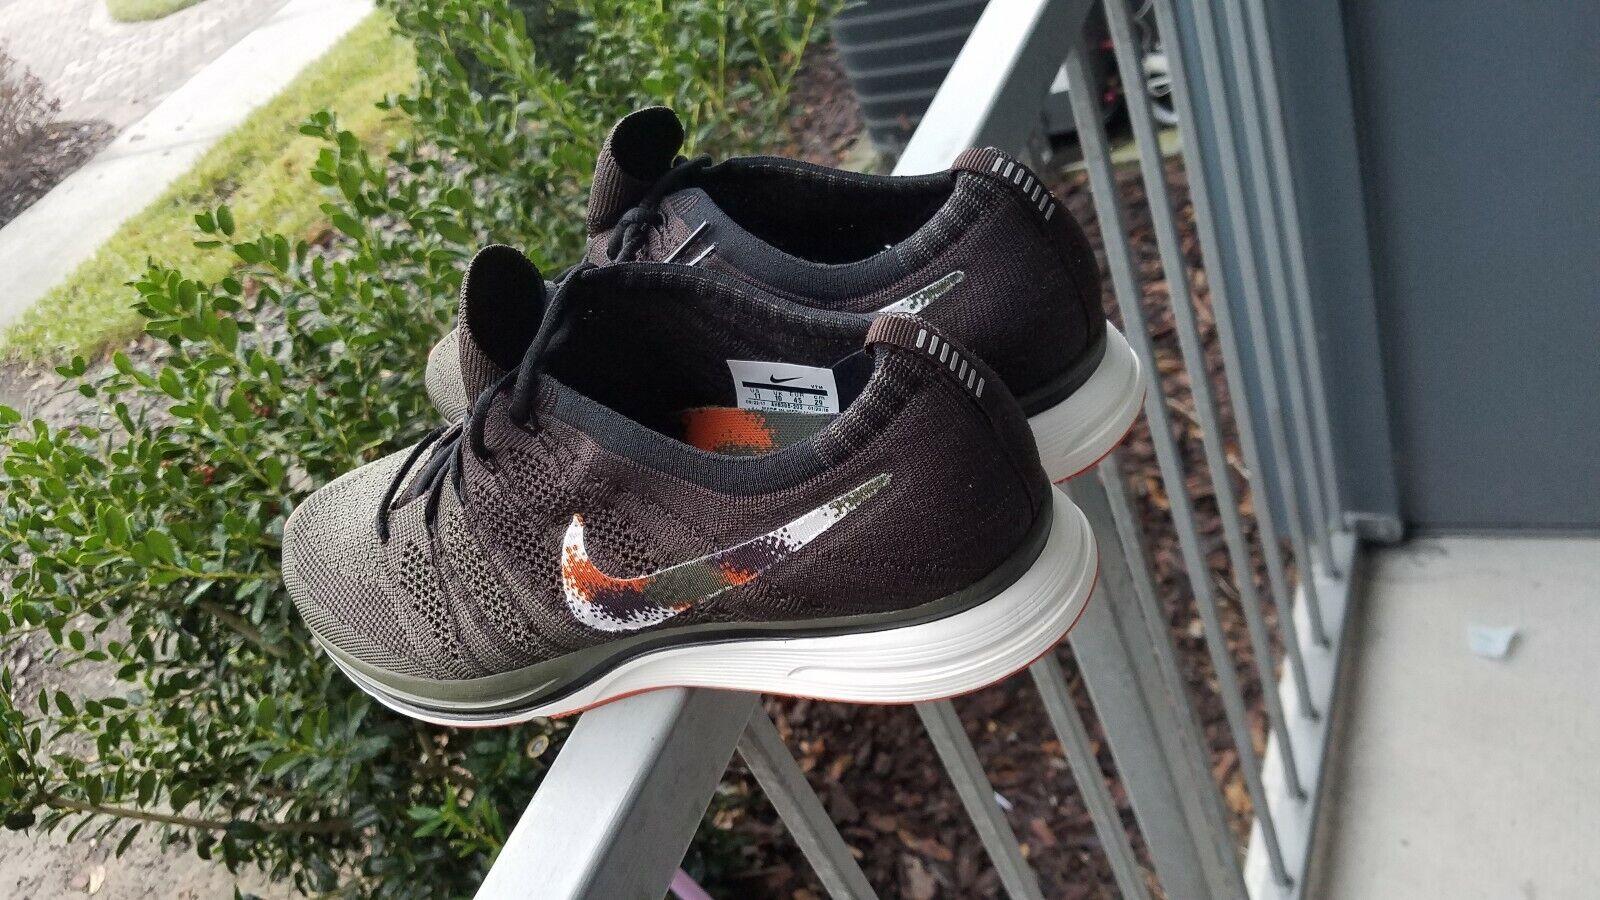 Nike Flyknit Trainer Men's   Women's running shoes AH8396 202 size 11 mens